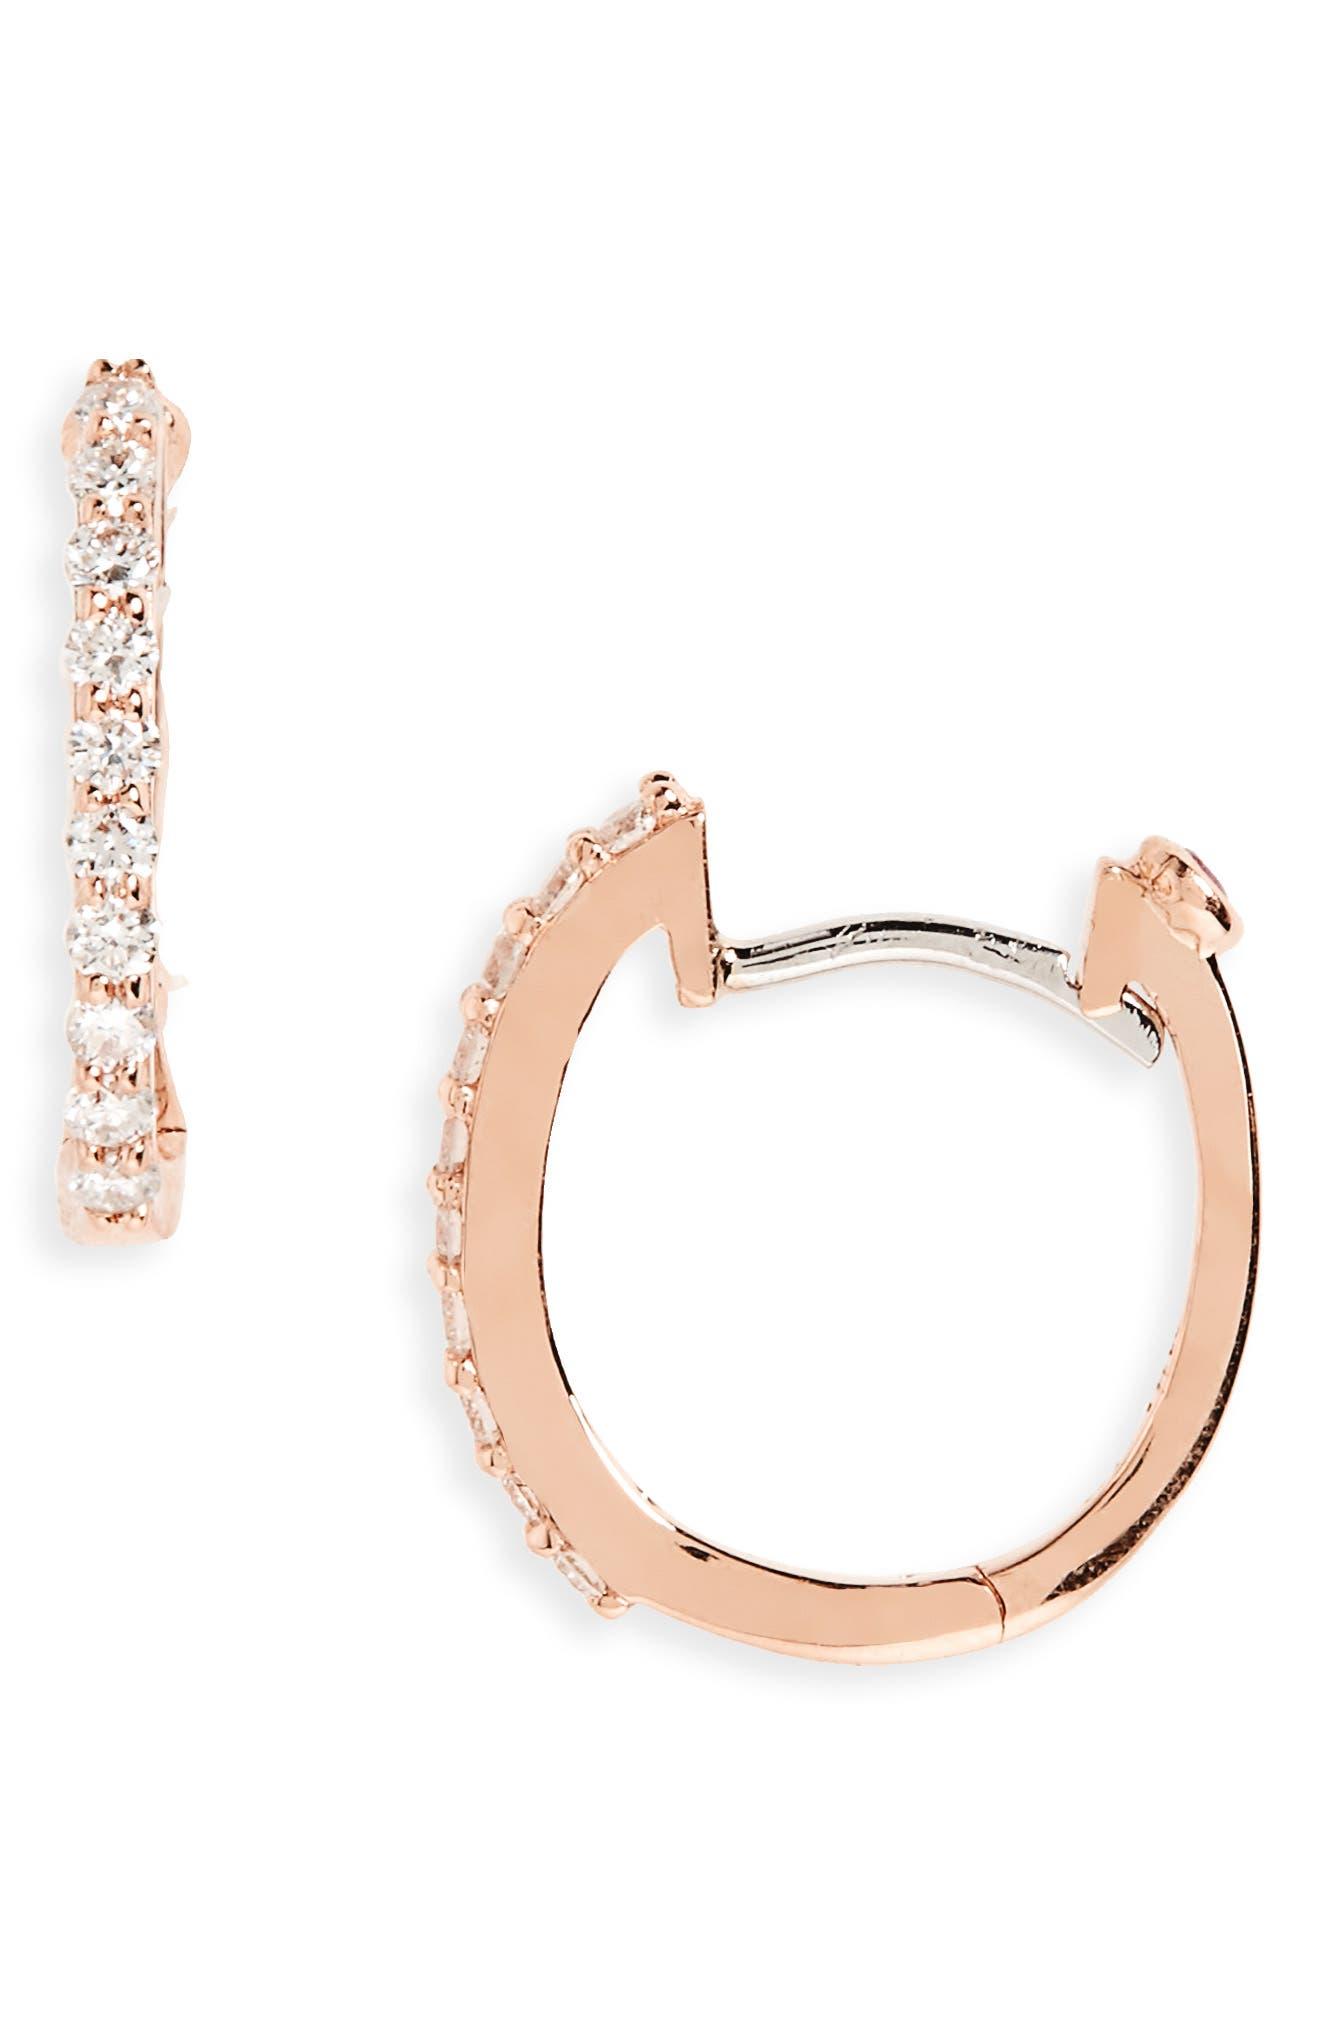 Small Diamond Hoop Earrings,                         Main,                         color, Rose Rold